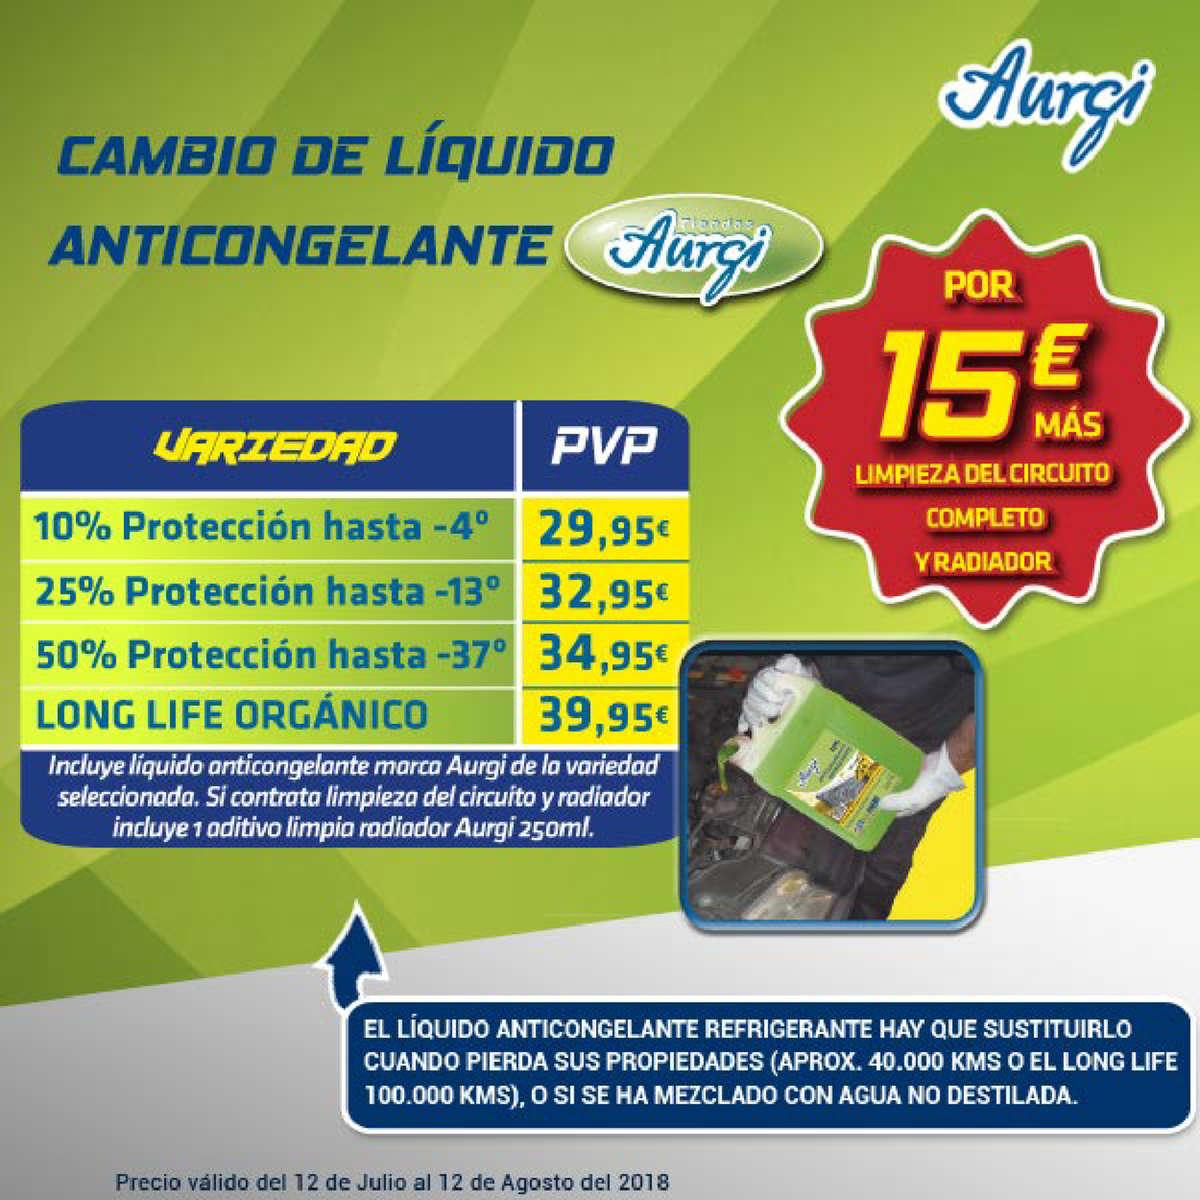 Comprar Anticongelante Barato En Fuengirola Ofertia